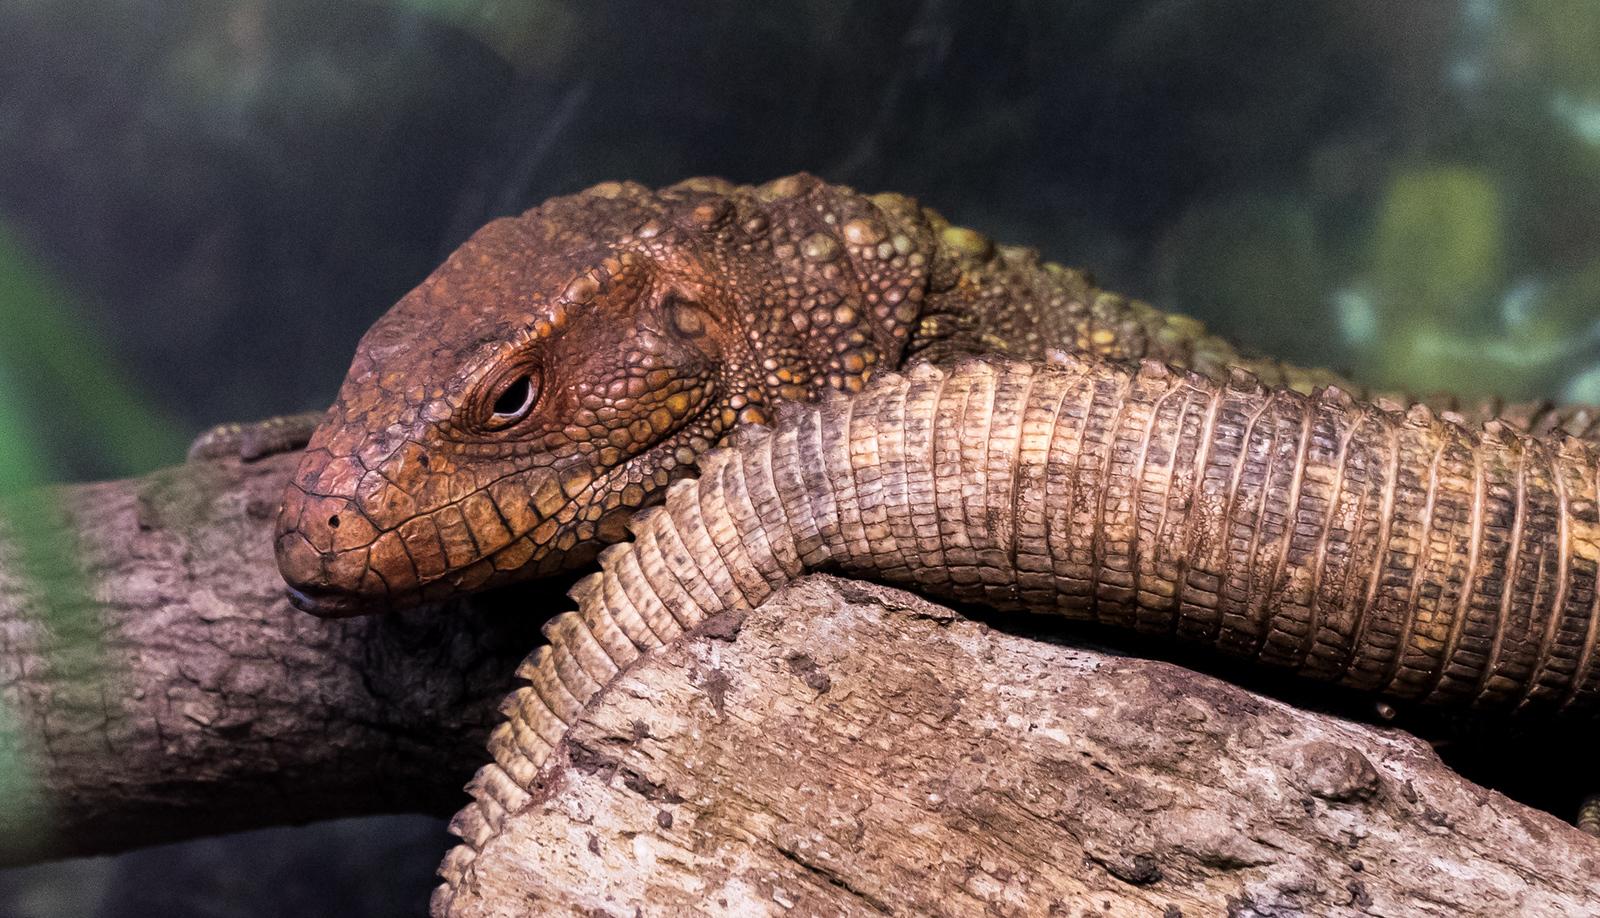 Zoo Atlanta.  The Beast Awakens.